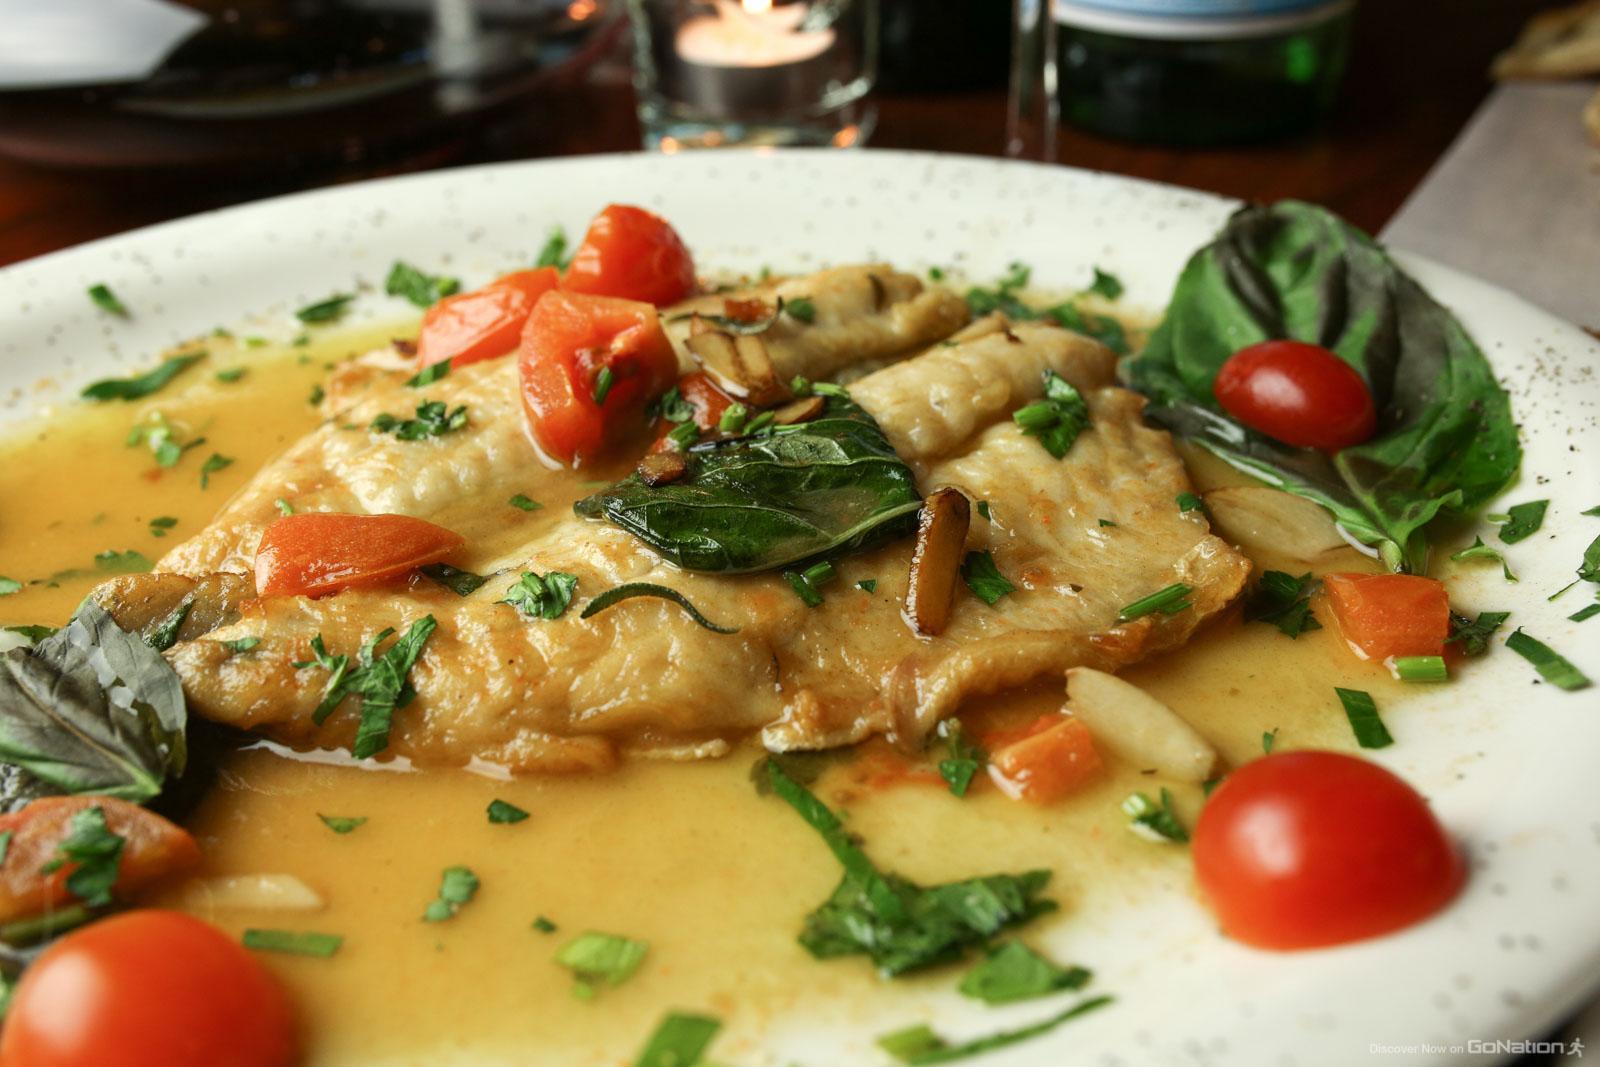 Italian Restaurant Near Me: Menu-Osteria Romana Italian Restaurant And Bar